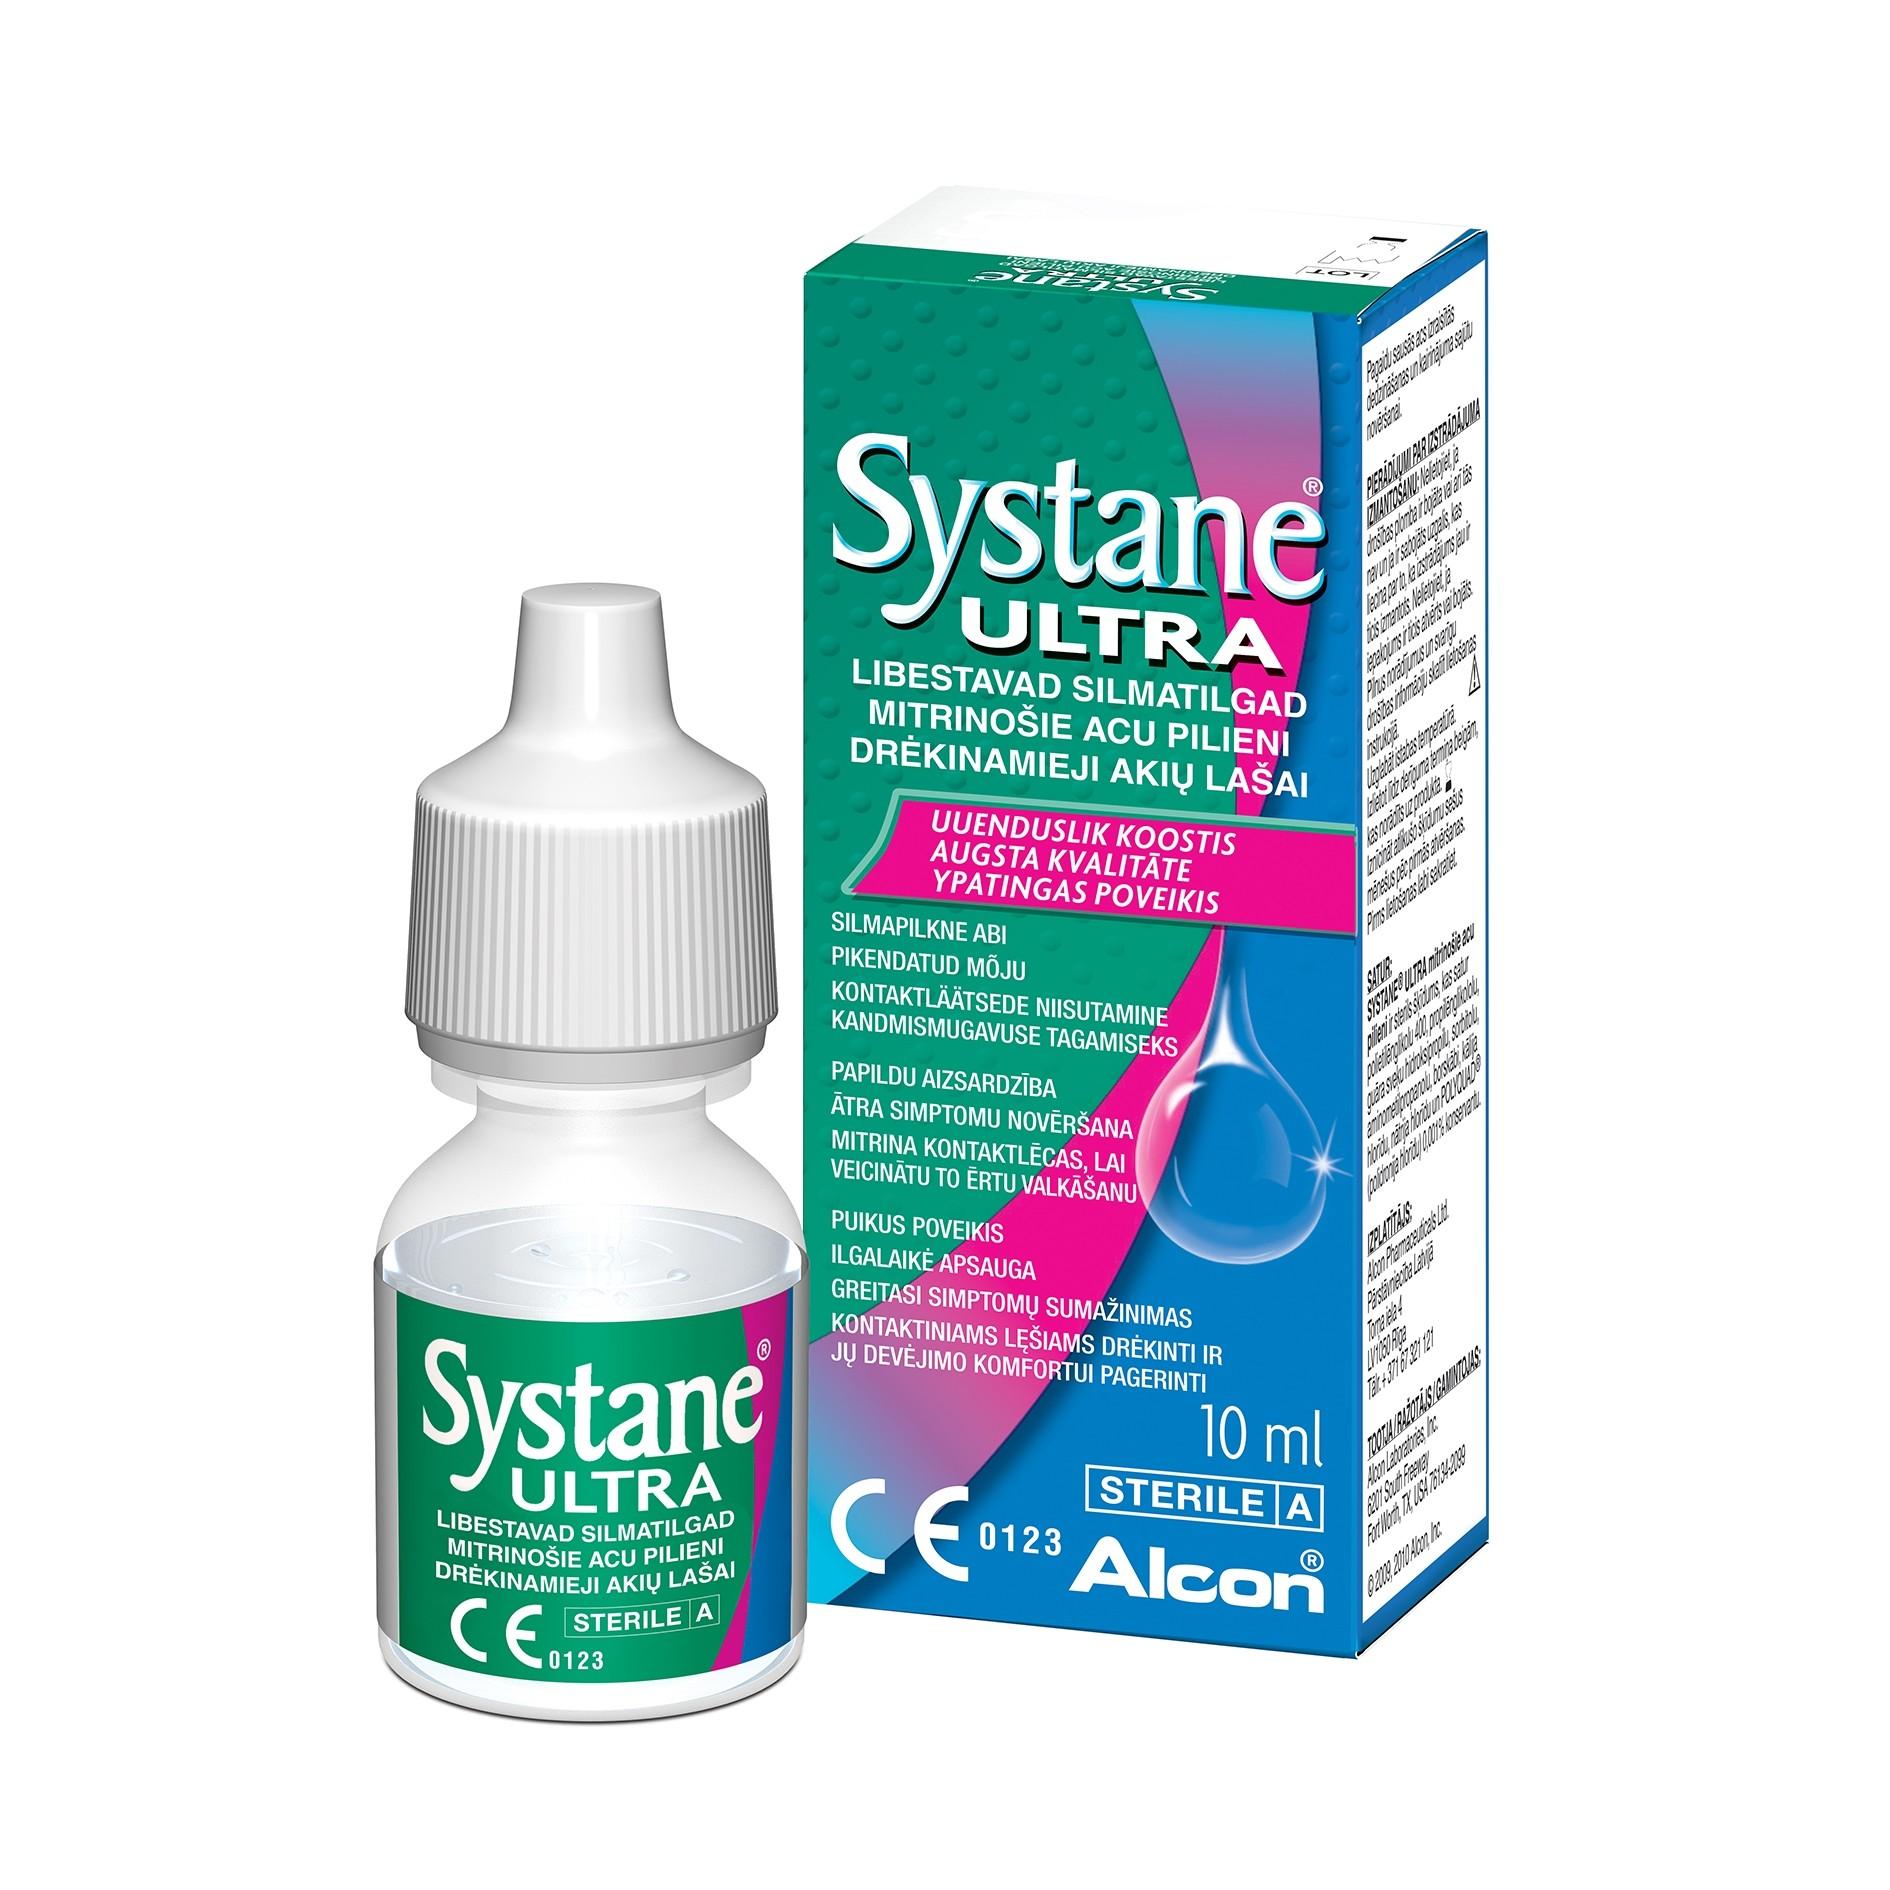 Systane Ultra 10ml